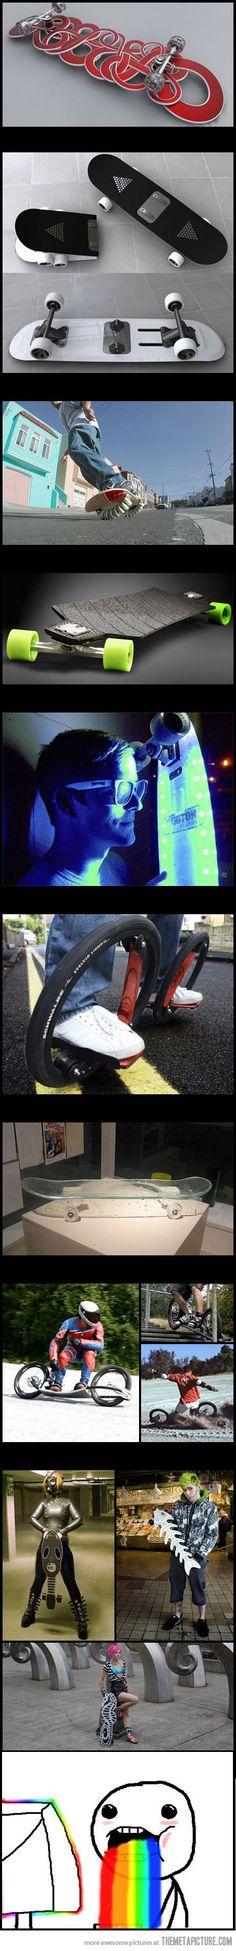 awesome skateboard designs!!